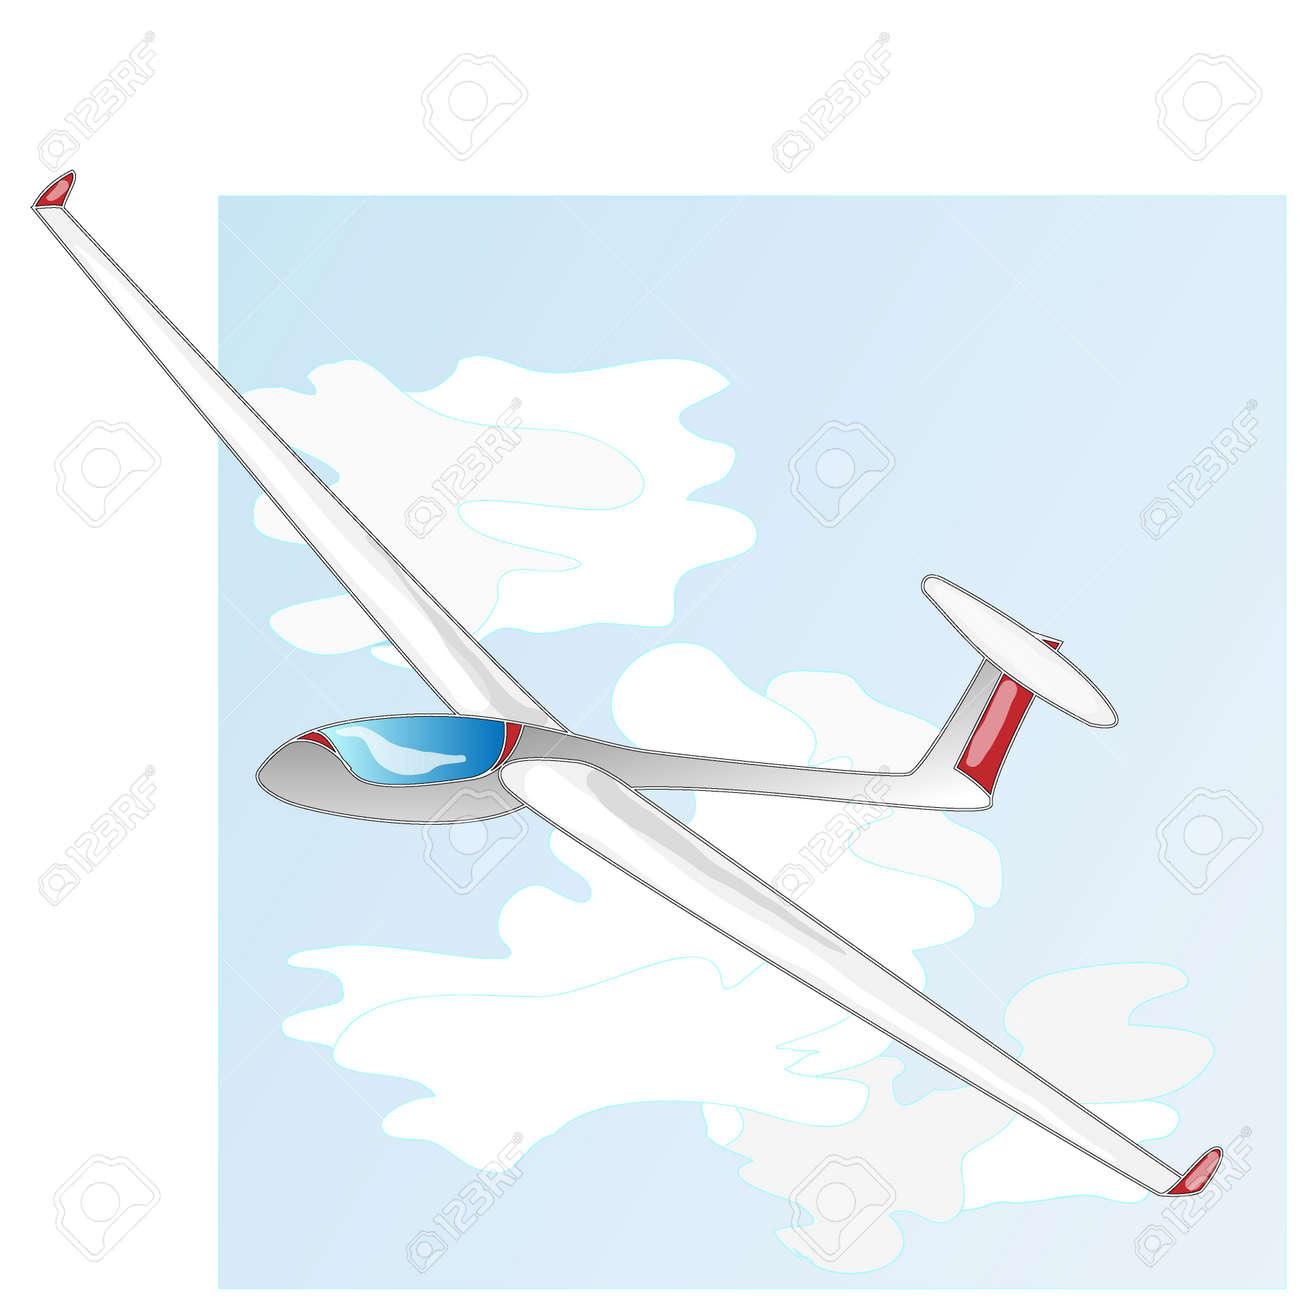 glider sailplane illustration isolated on sky background royalty